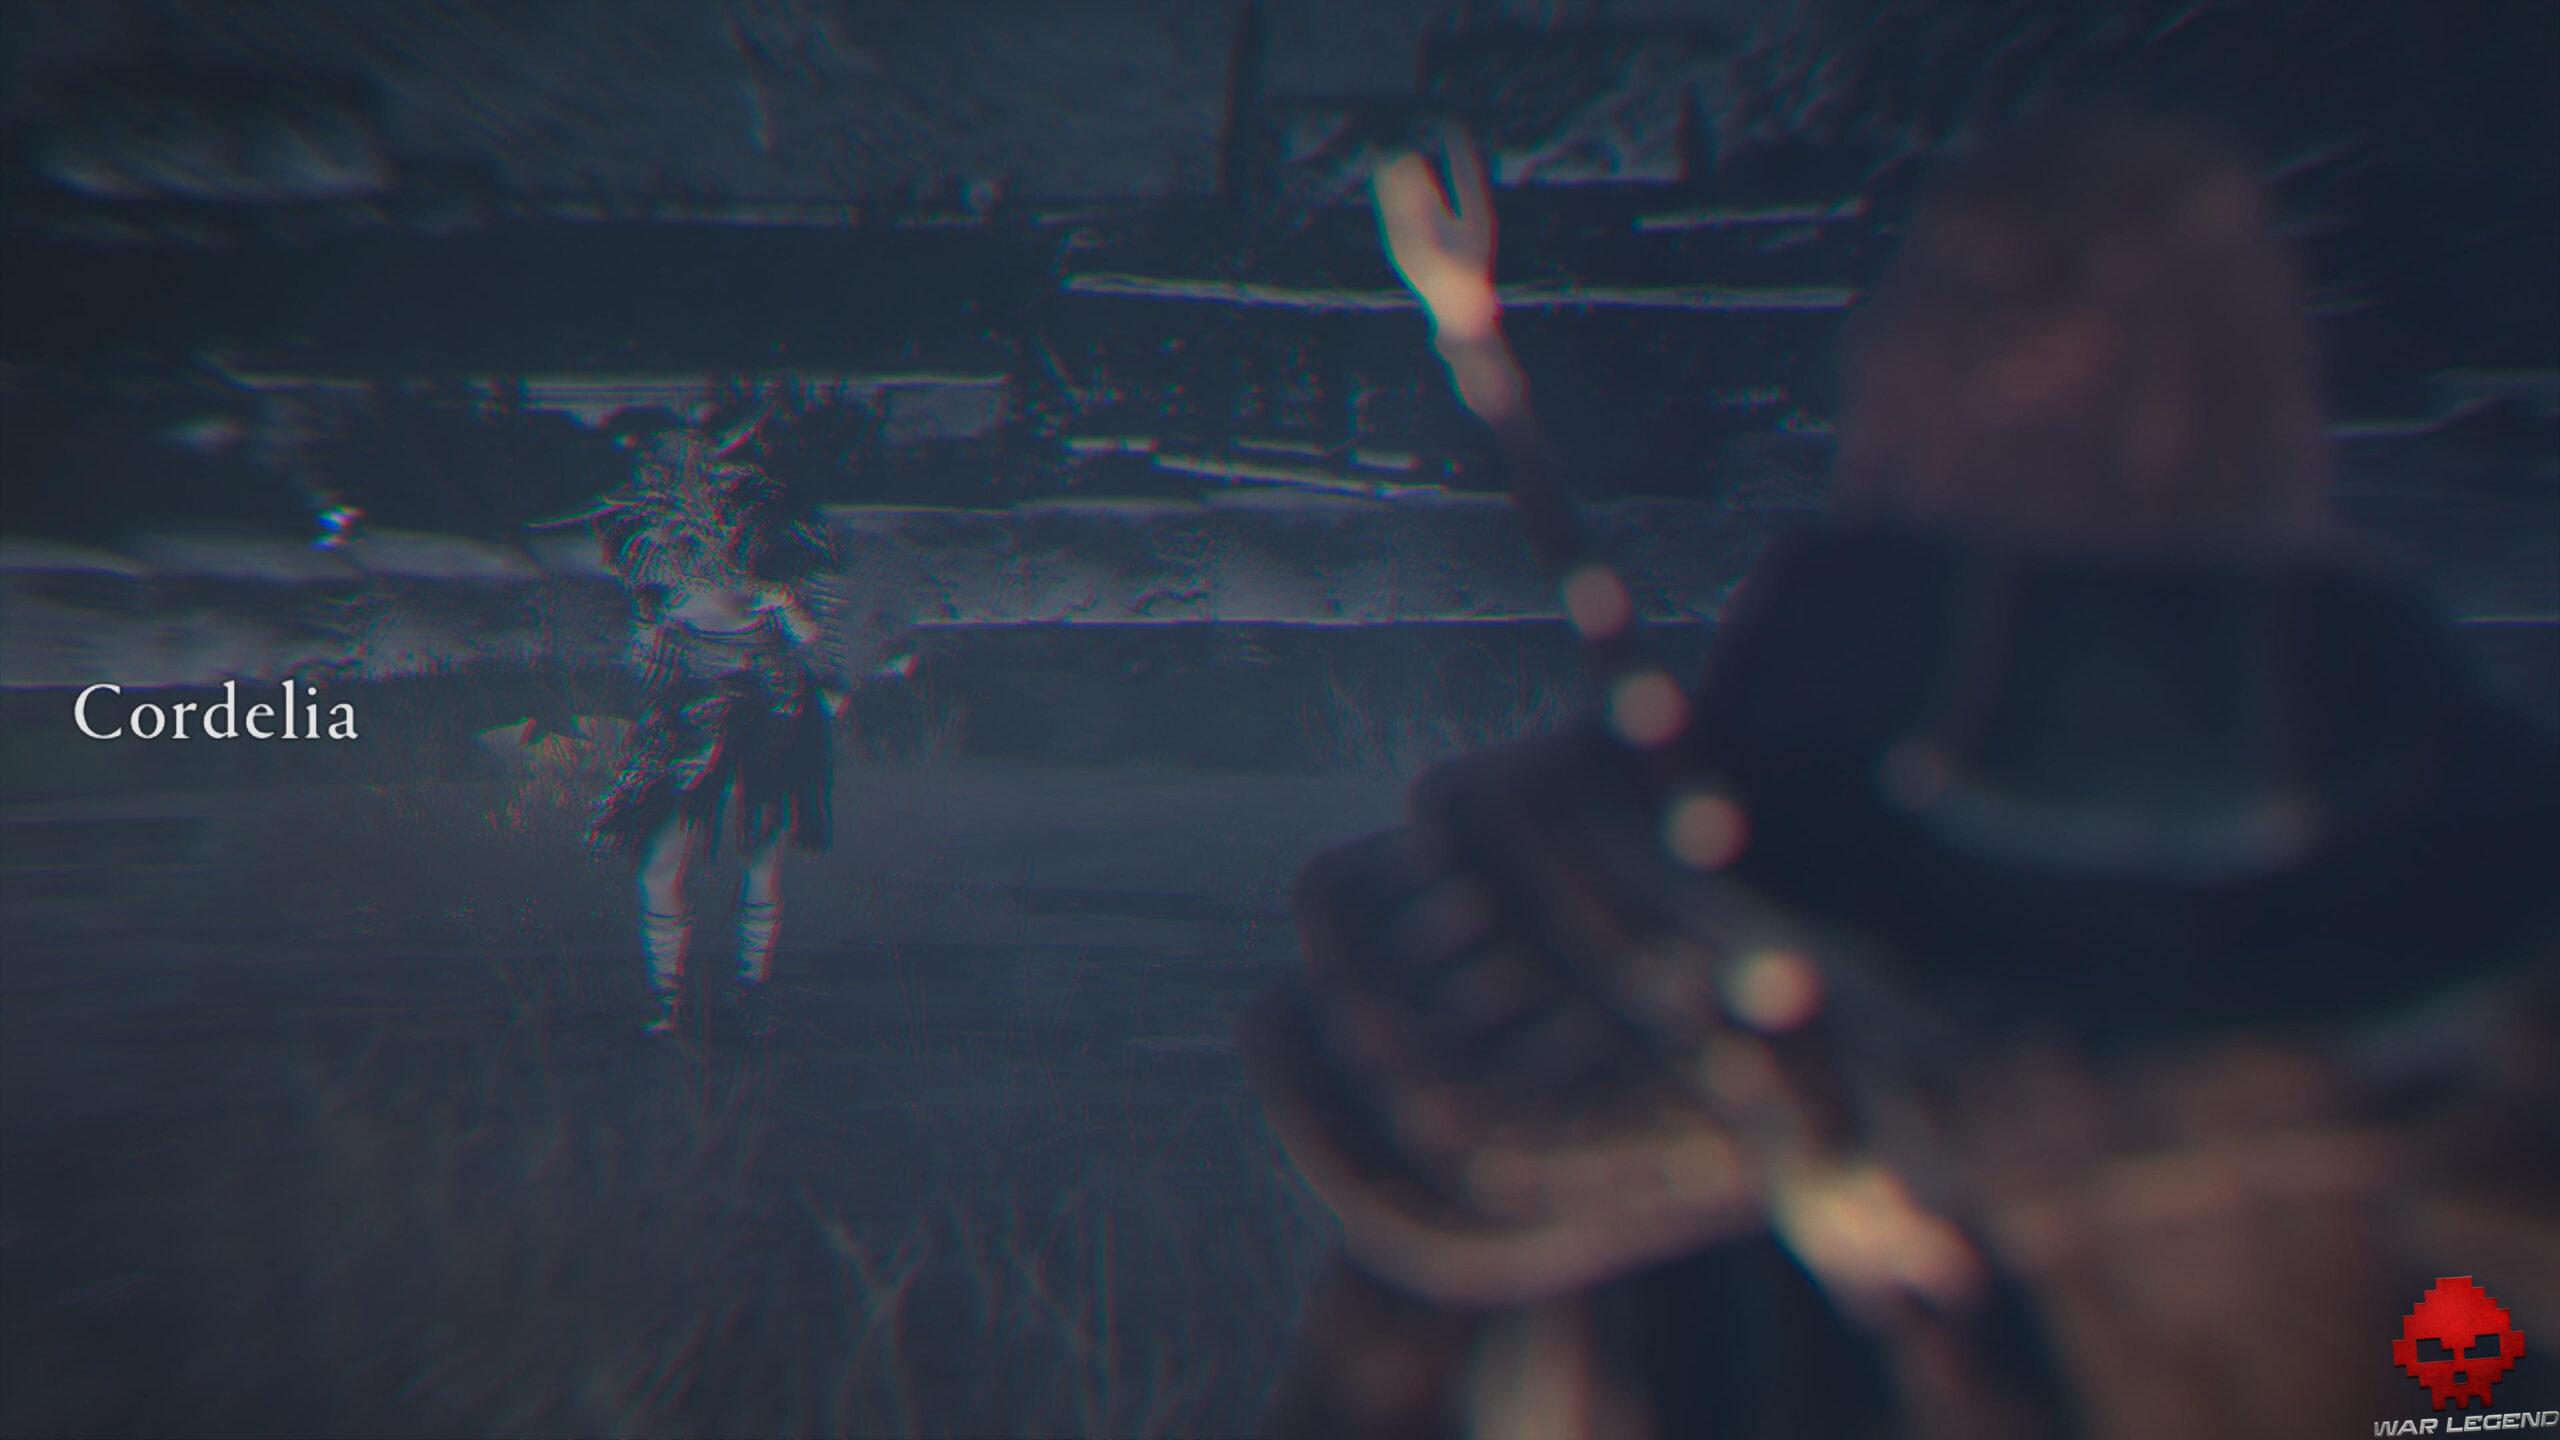 Cordelia Assassin's Creed Valhalla